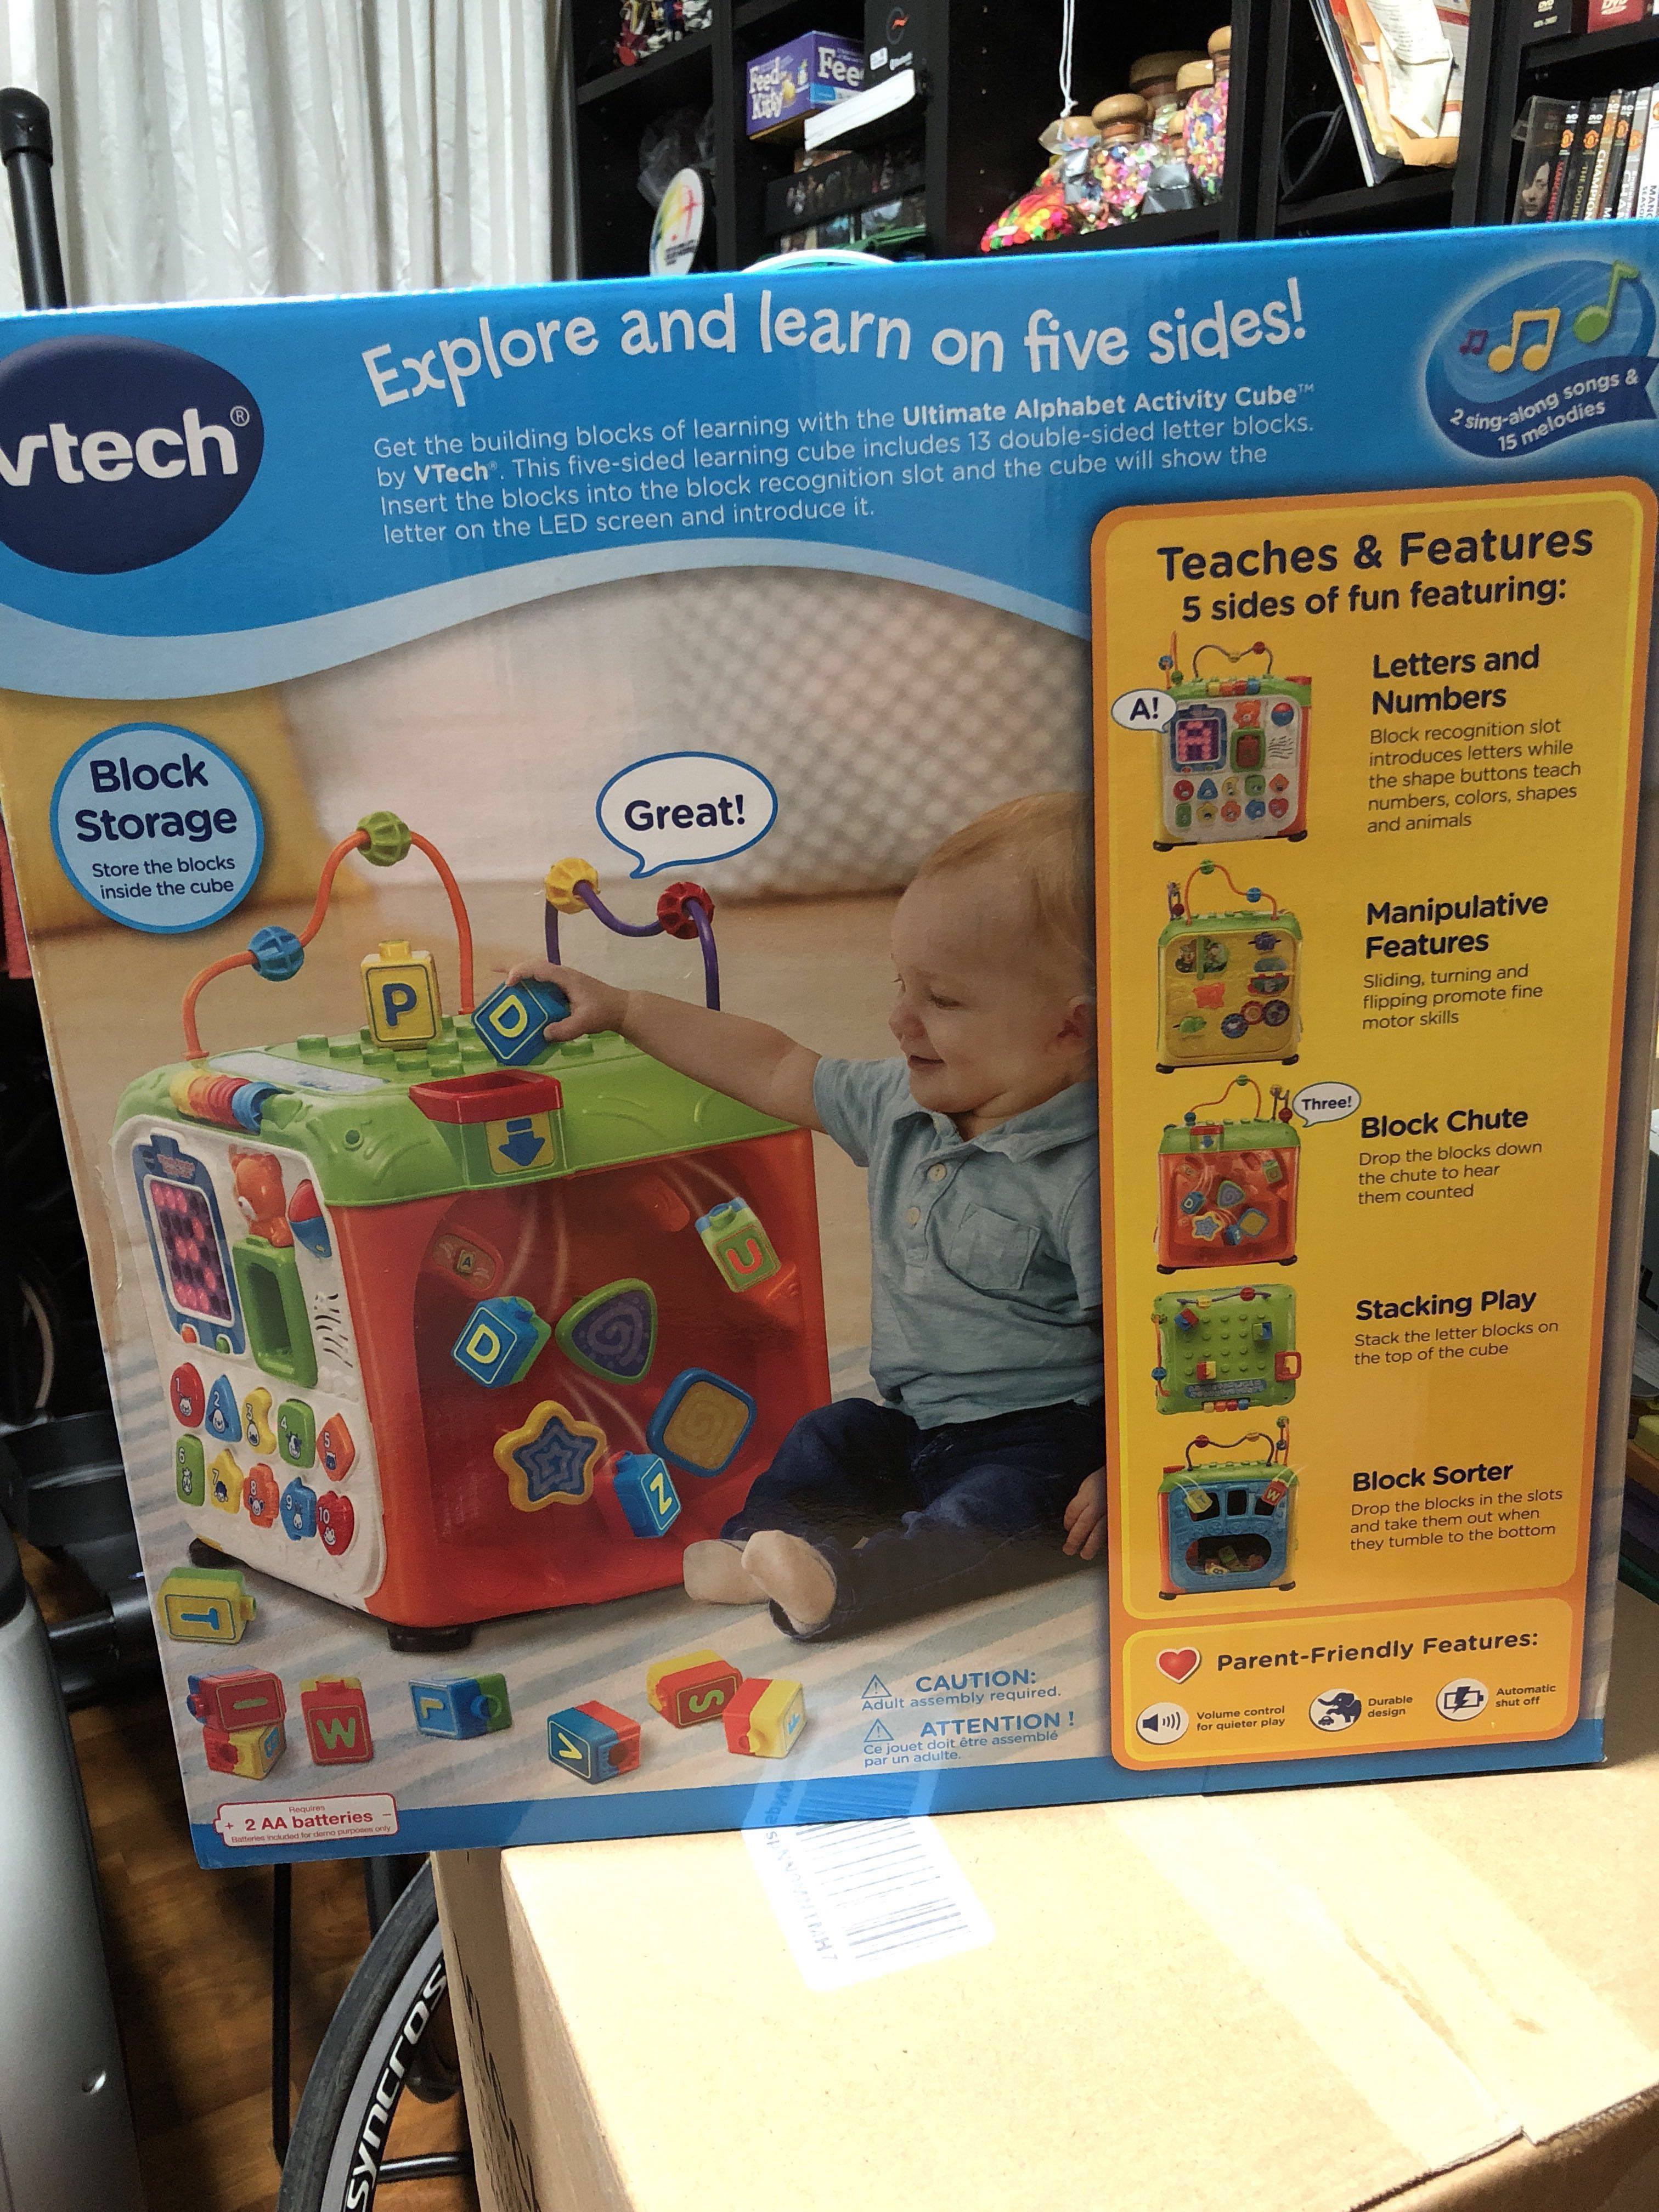 Vtech Ultimate Alphabet Activity Cube Toys R Us Best Of Alphabet